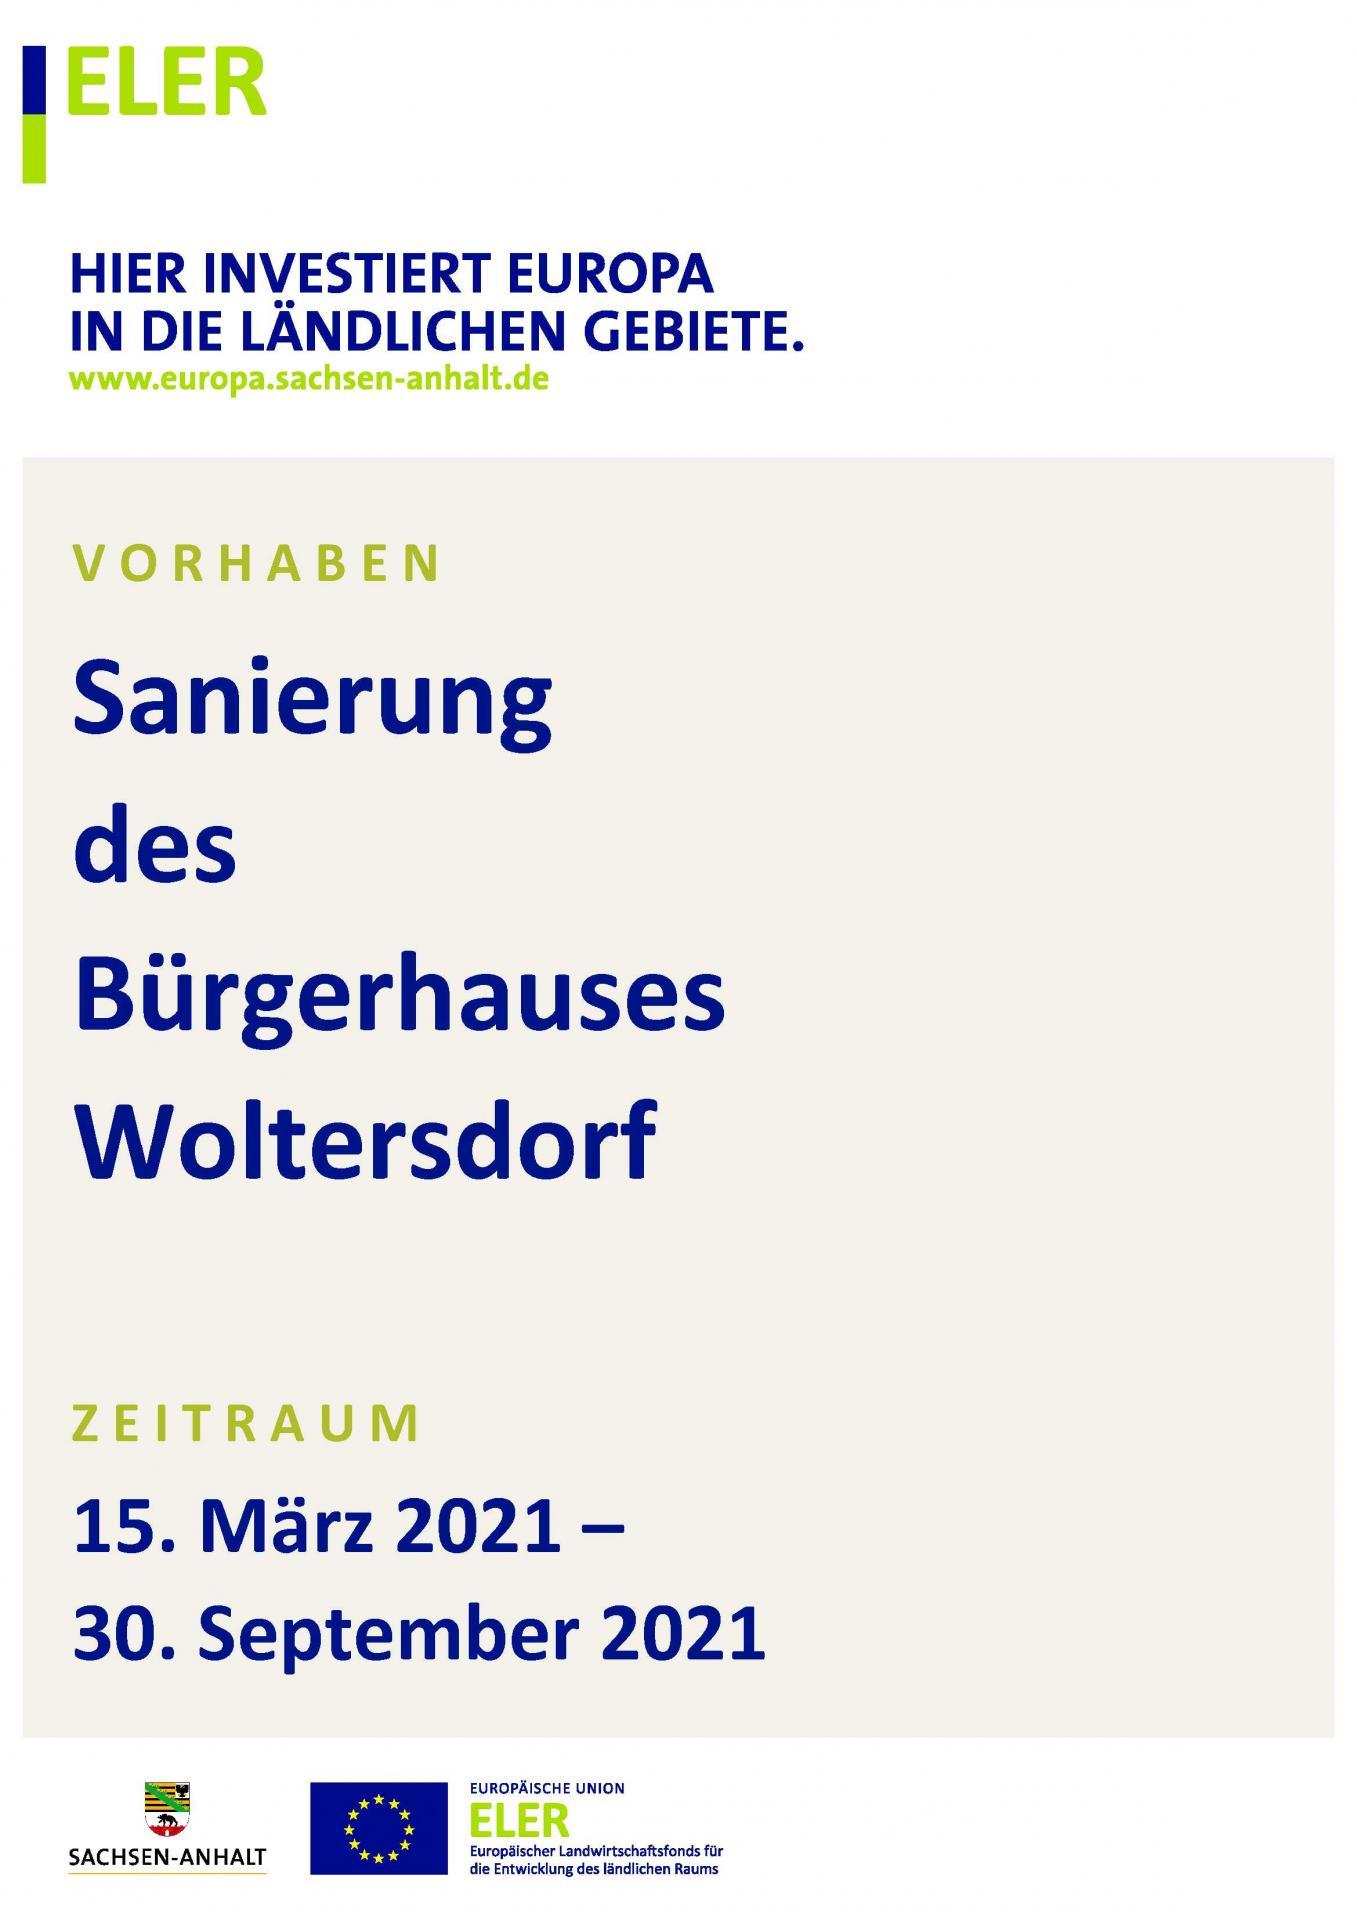 Sanierung  des Bürgerhauses Woltersdorf